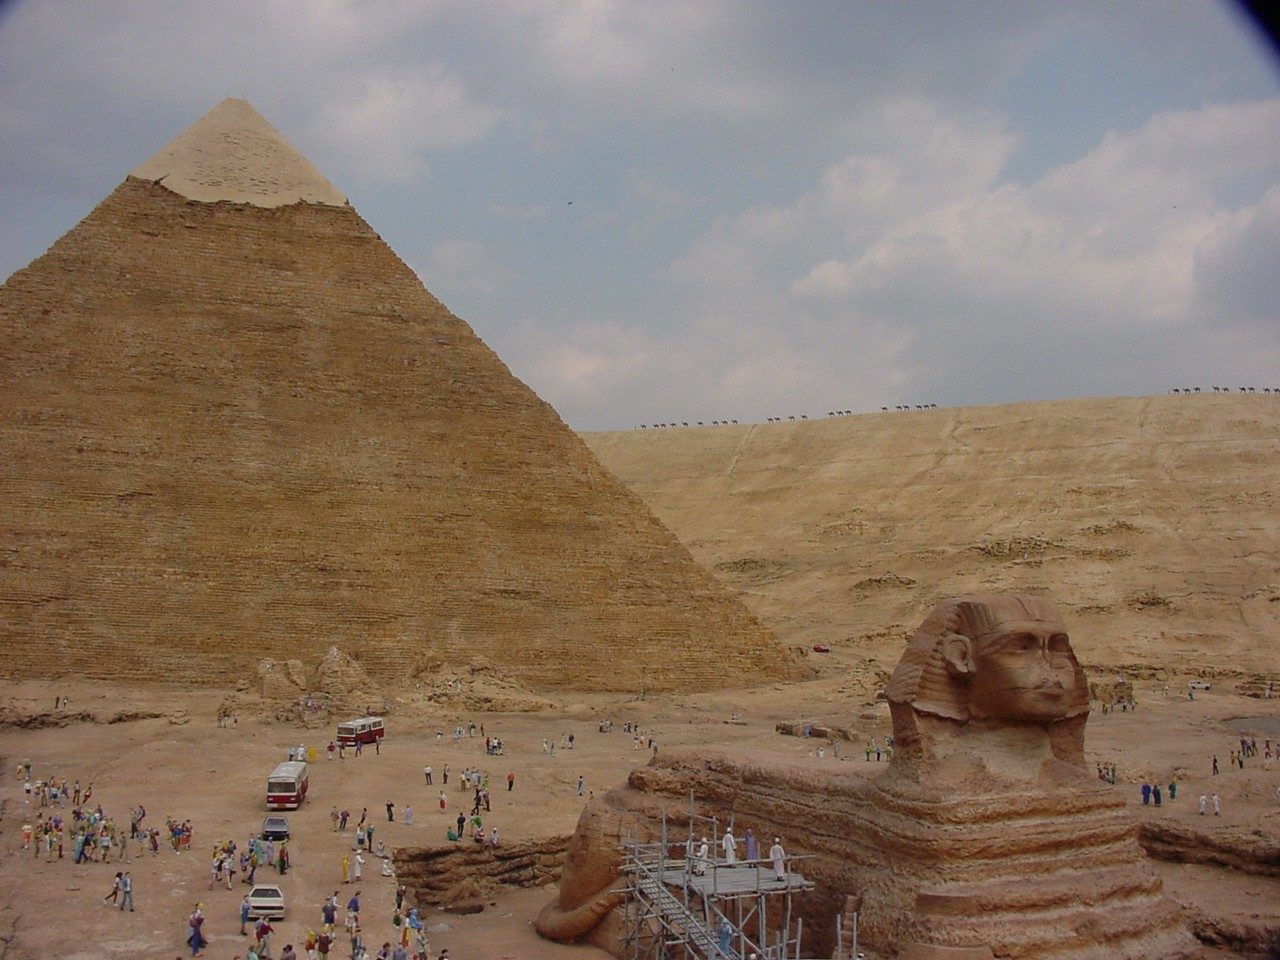 загадки египта фото хочу